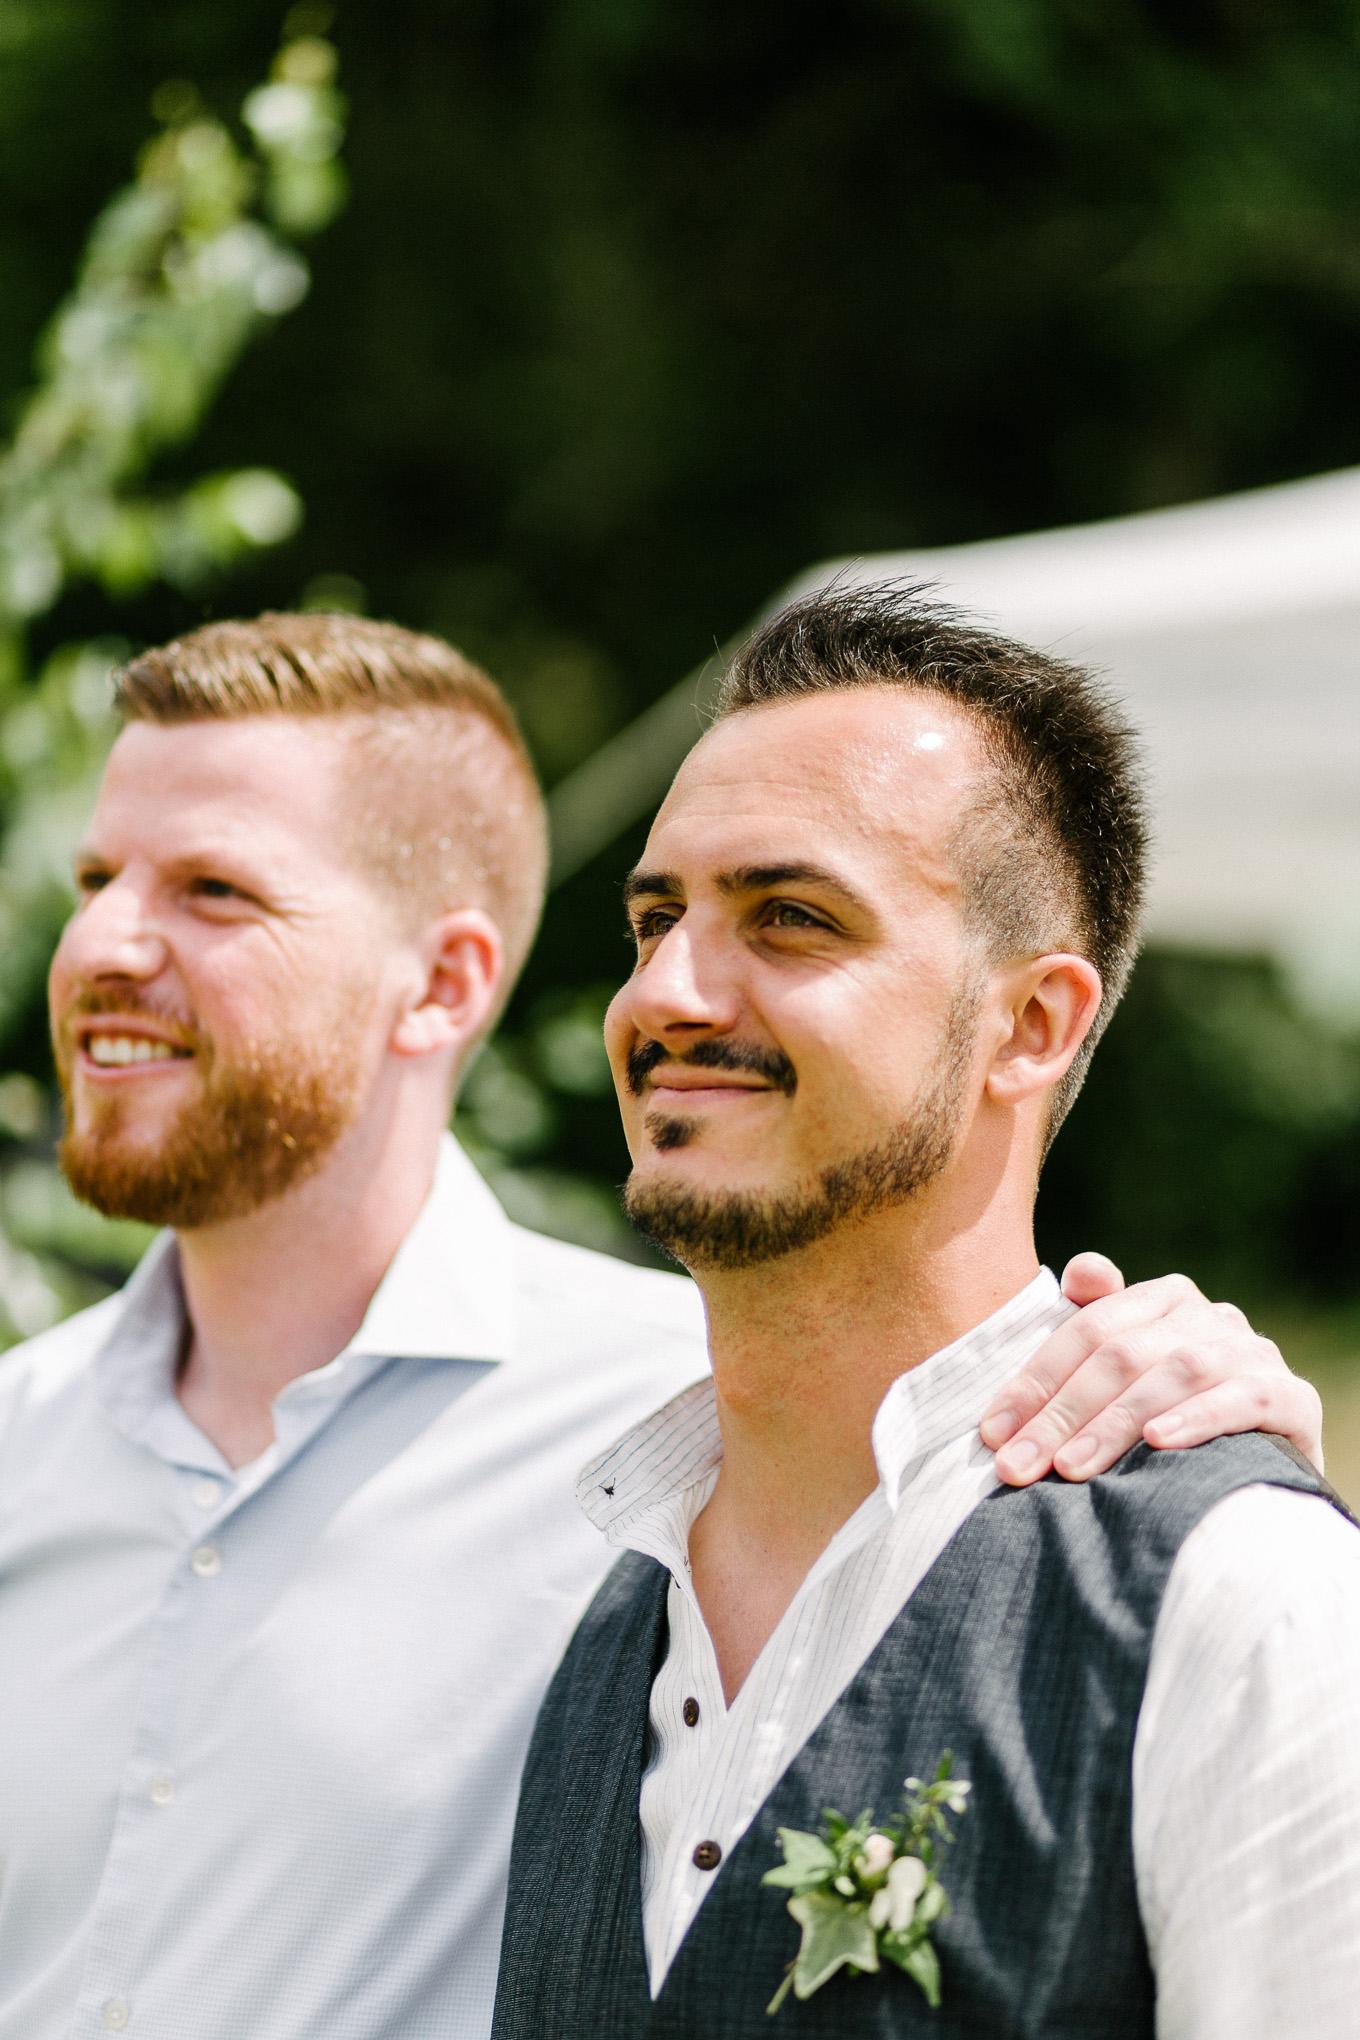 Boho-Scheune-Bauern-Hochzeit-Lörrach-Rheinfelden-Pia-Anna-Christian-Photography-NC-27.jpg